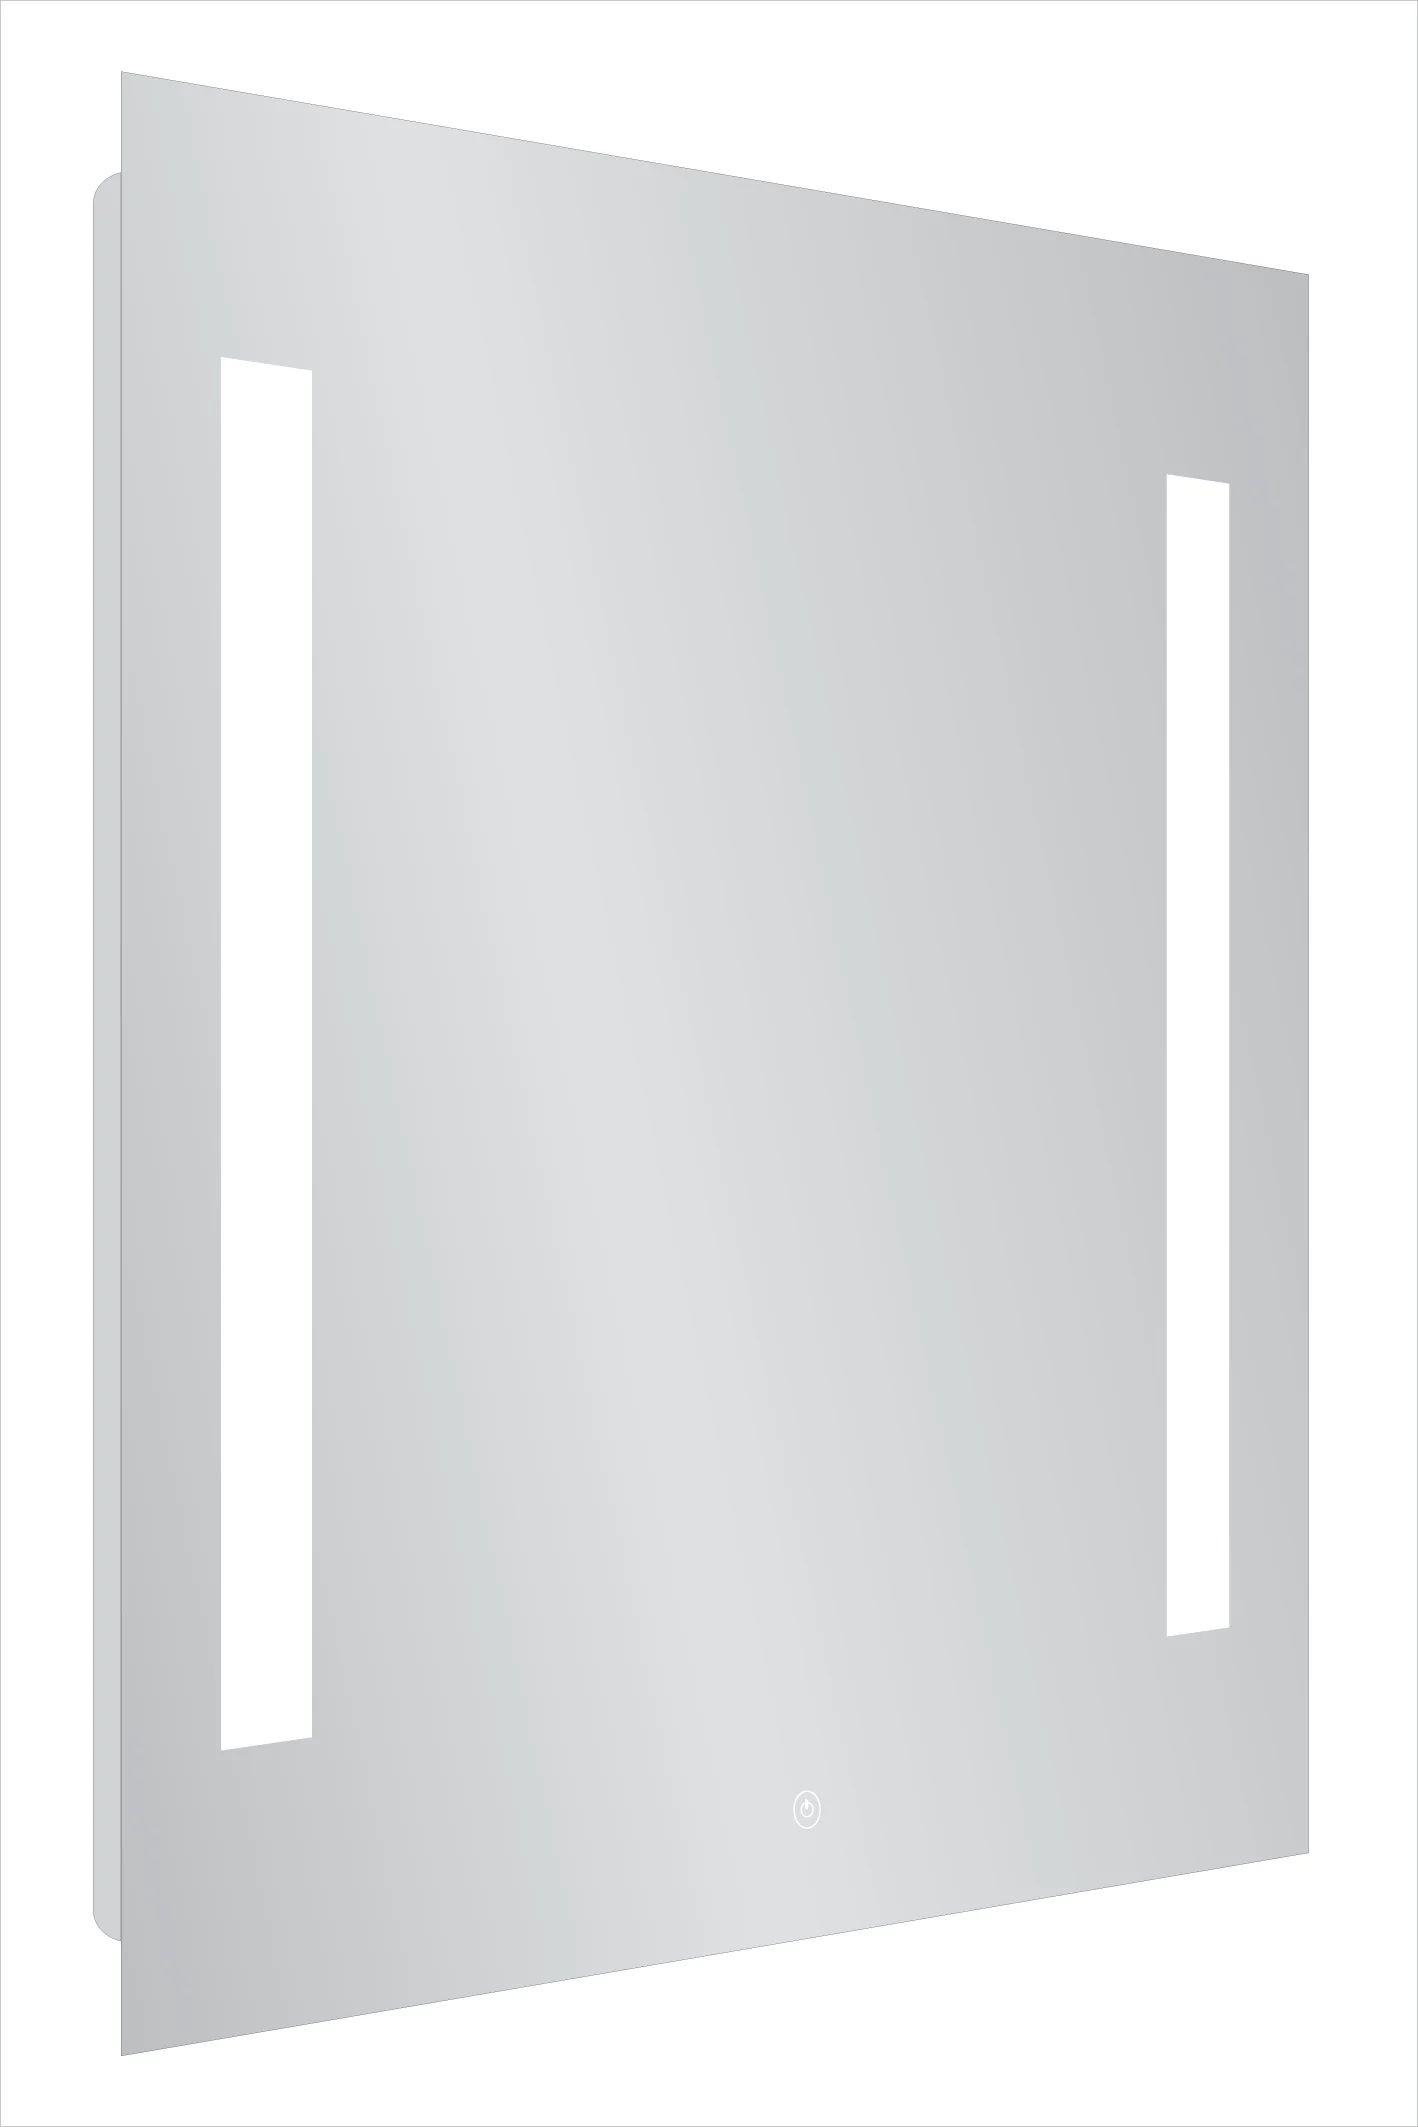 Miroir Lumineux Avec Eclairage Integre L 60 X H 70 Cm Easy Leroy Merlin